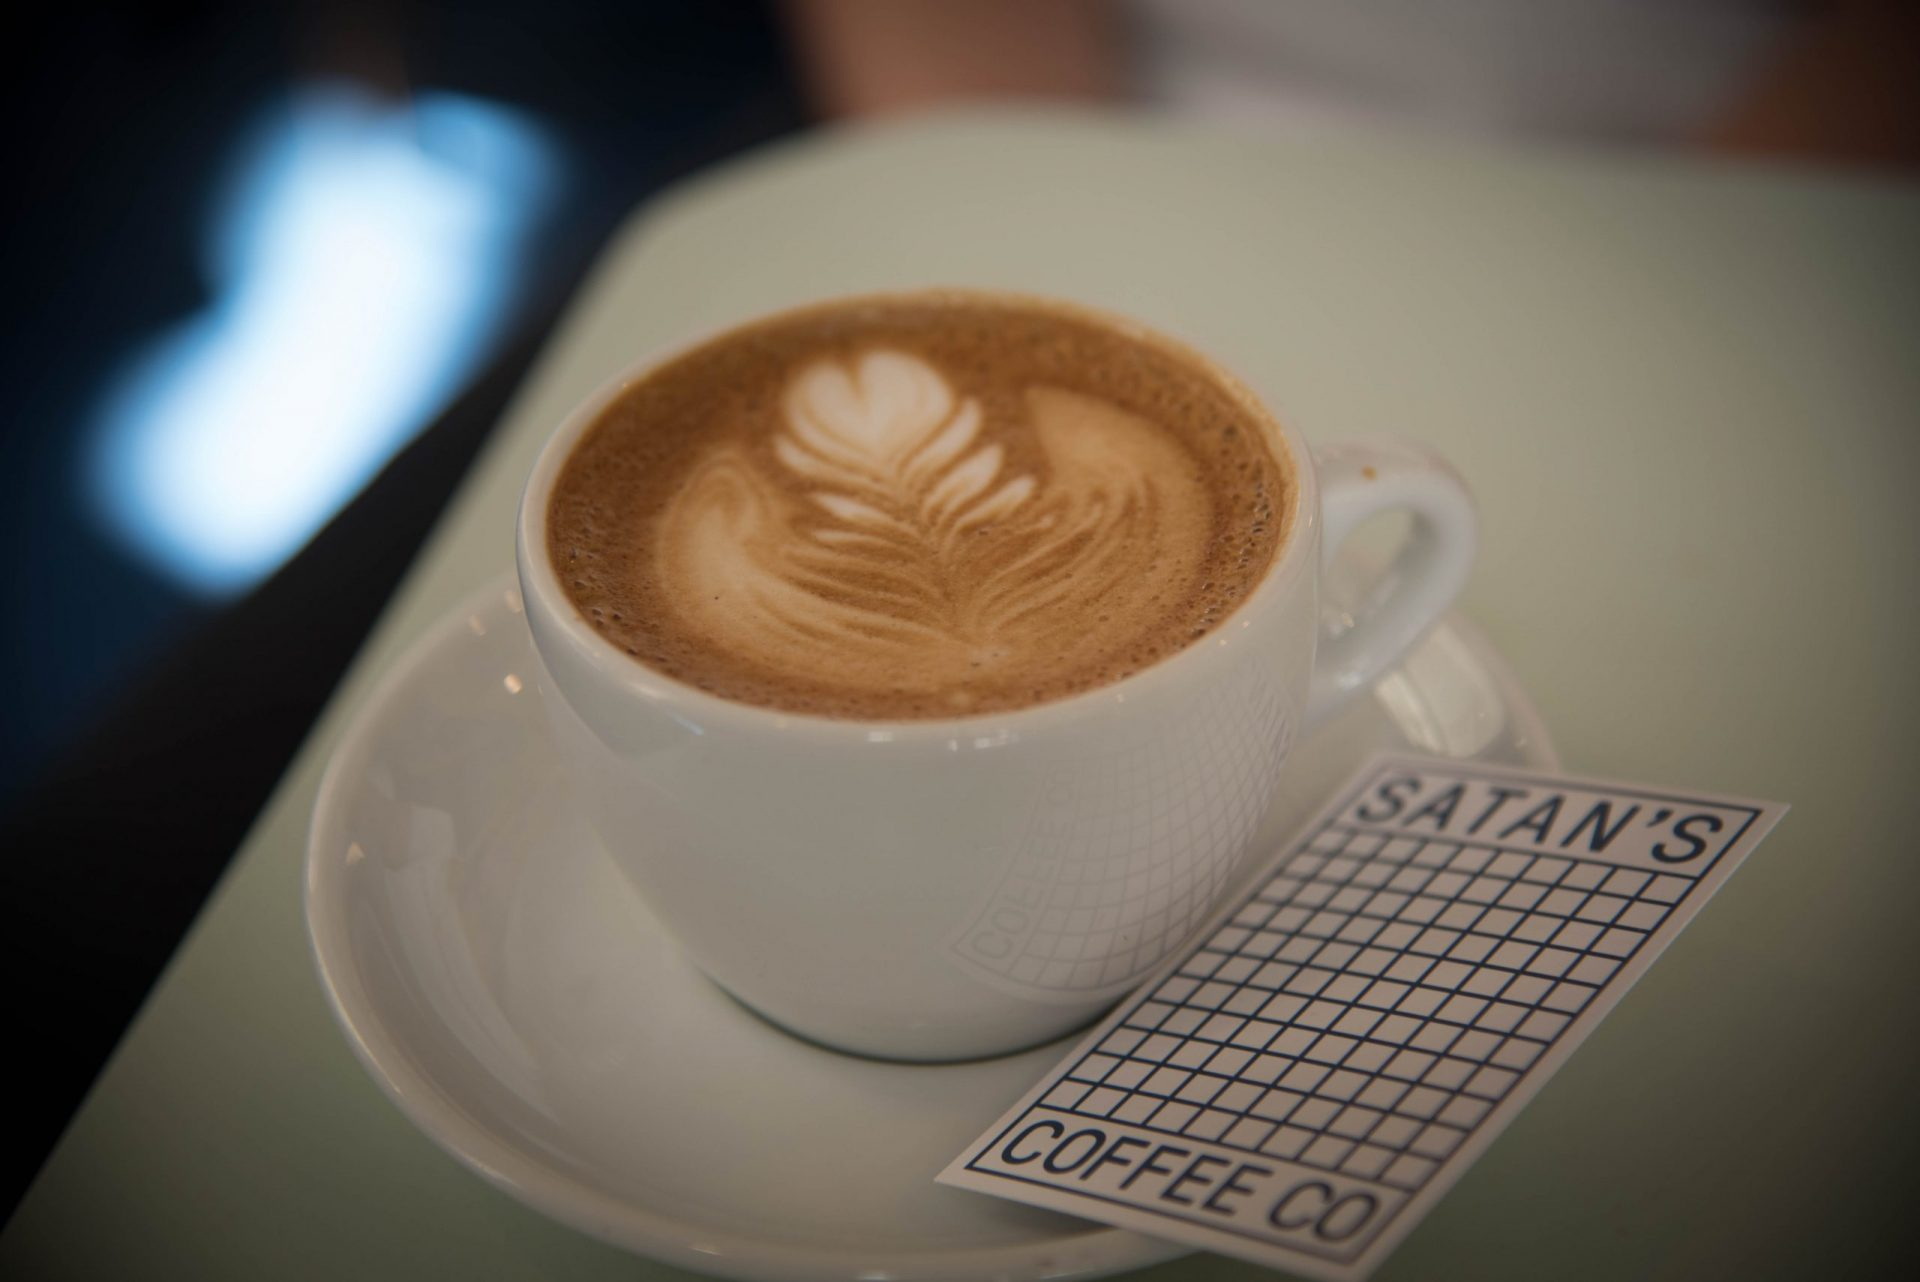 Satan´s Coffee Co. in Barcelona